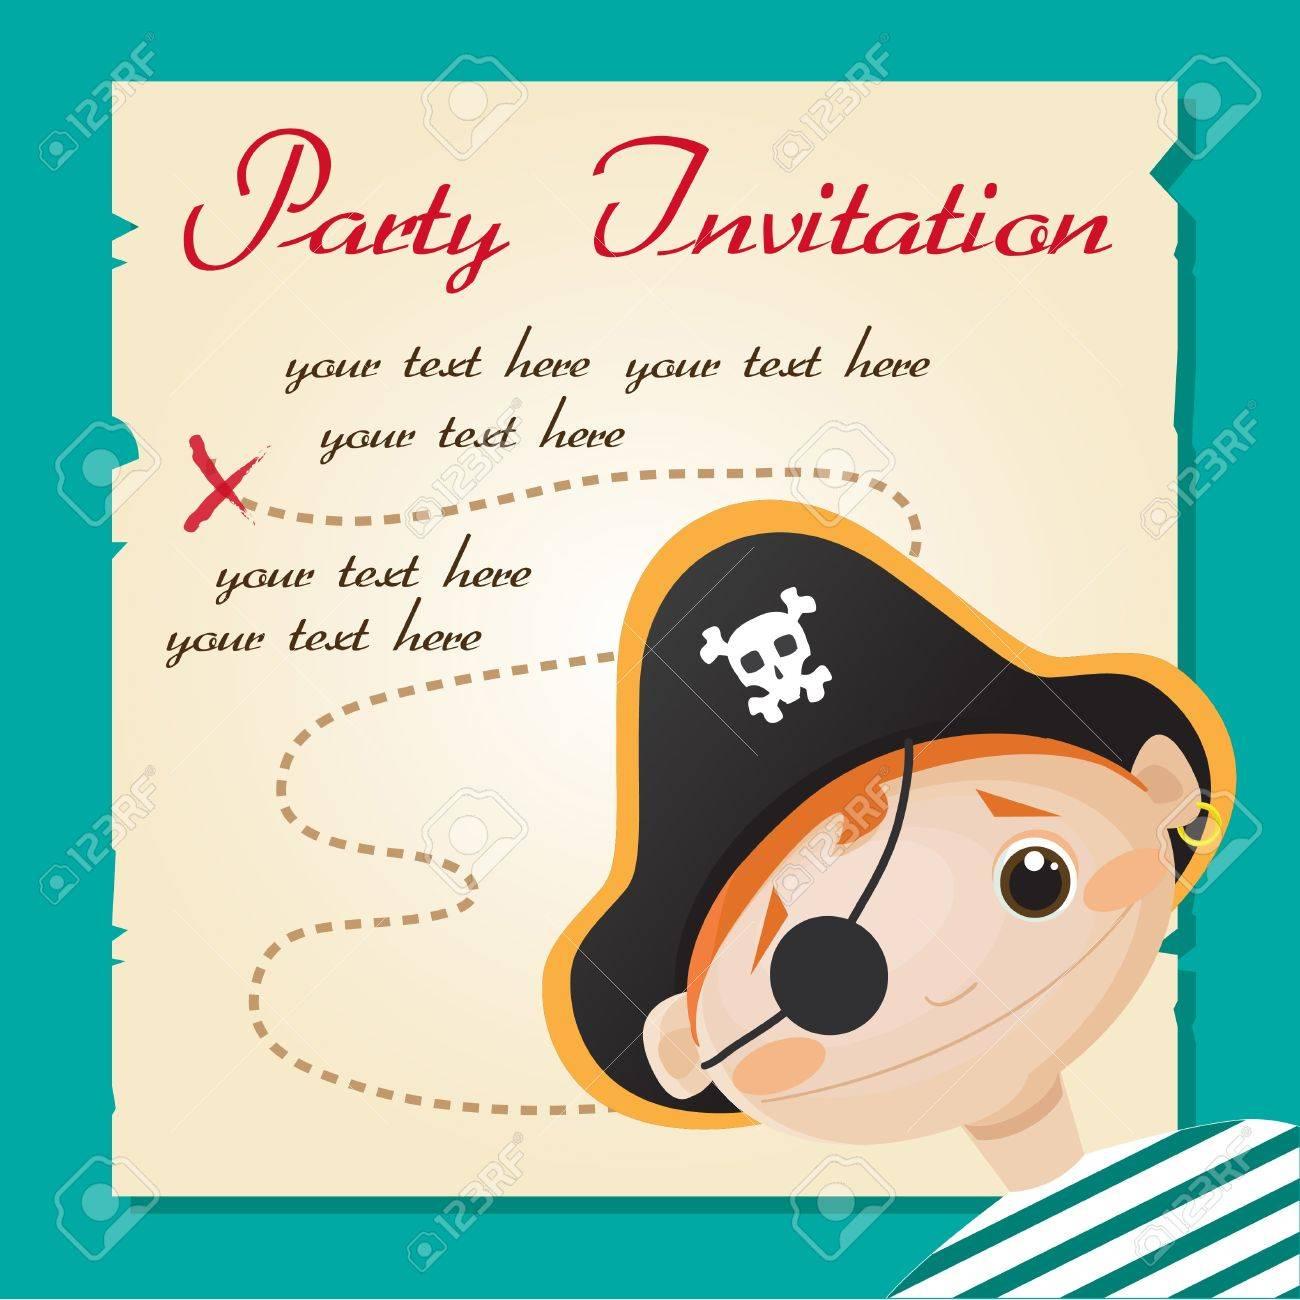 Pirate Party Invitation Vector Illustration Royalty Free Cliparts – Pirate Party Invitation